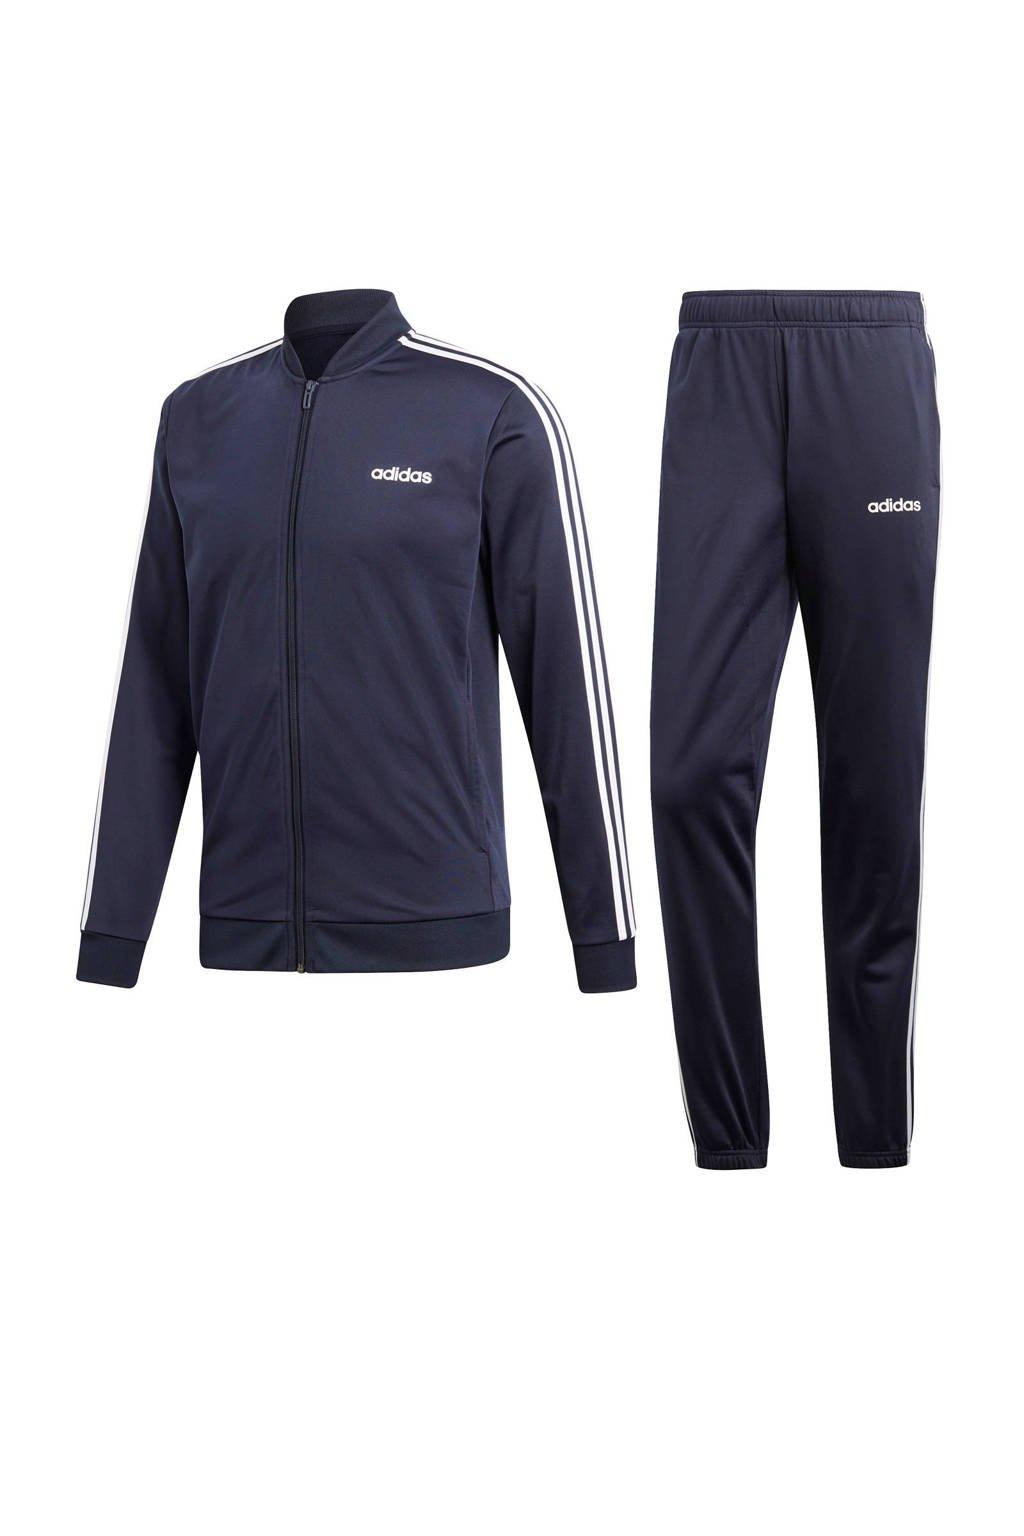 adidas Performance   trainingspak donkerblauw, Donkerblauw